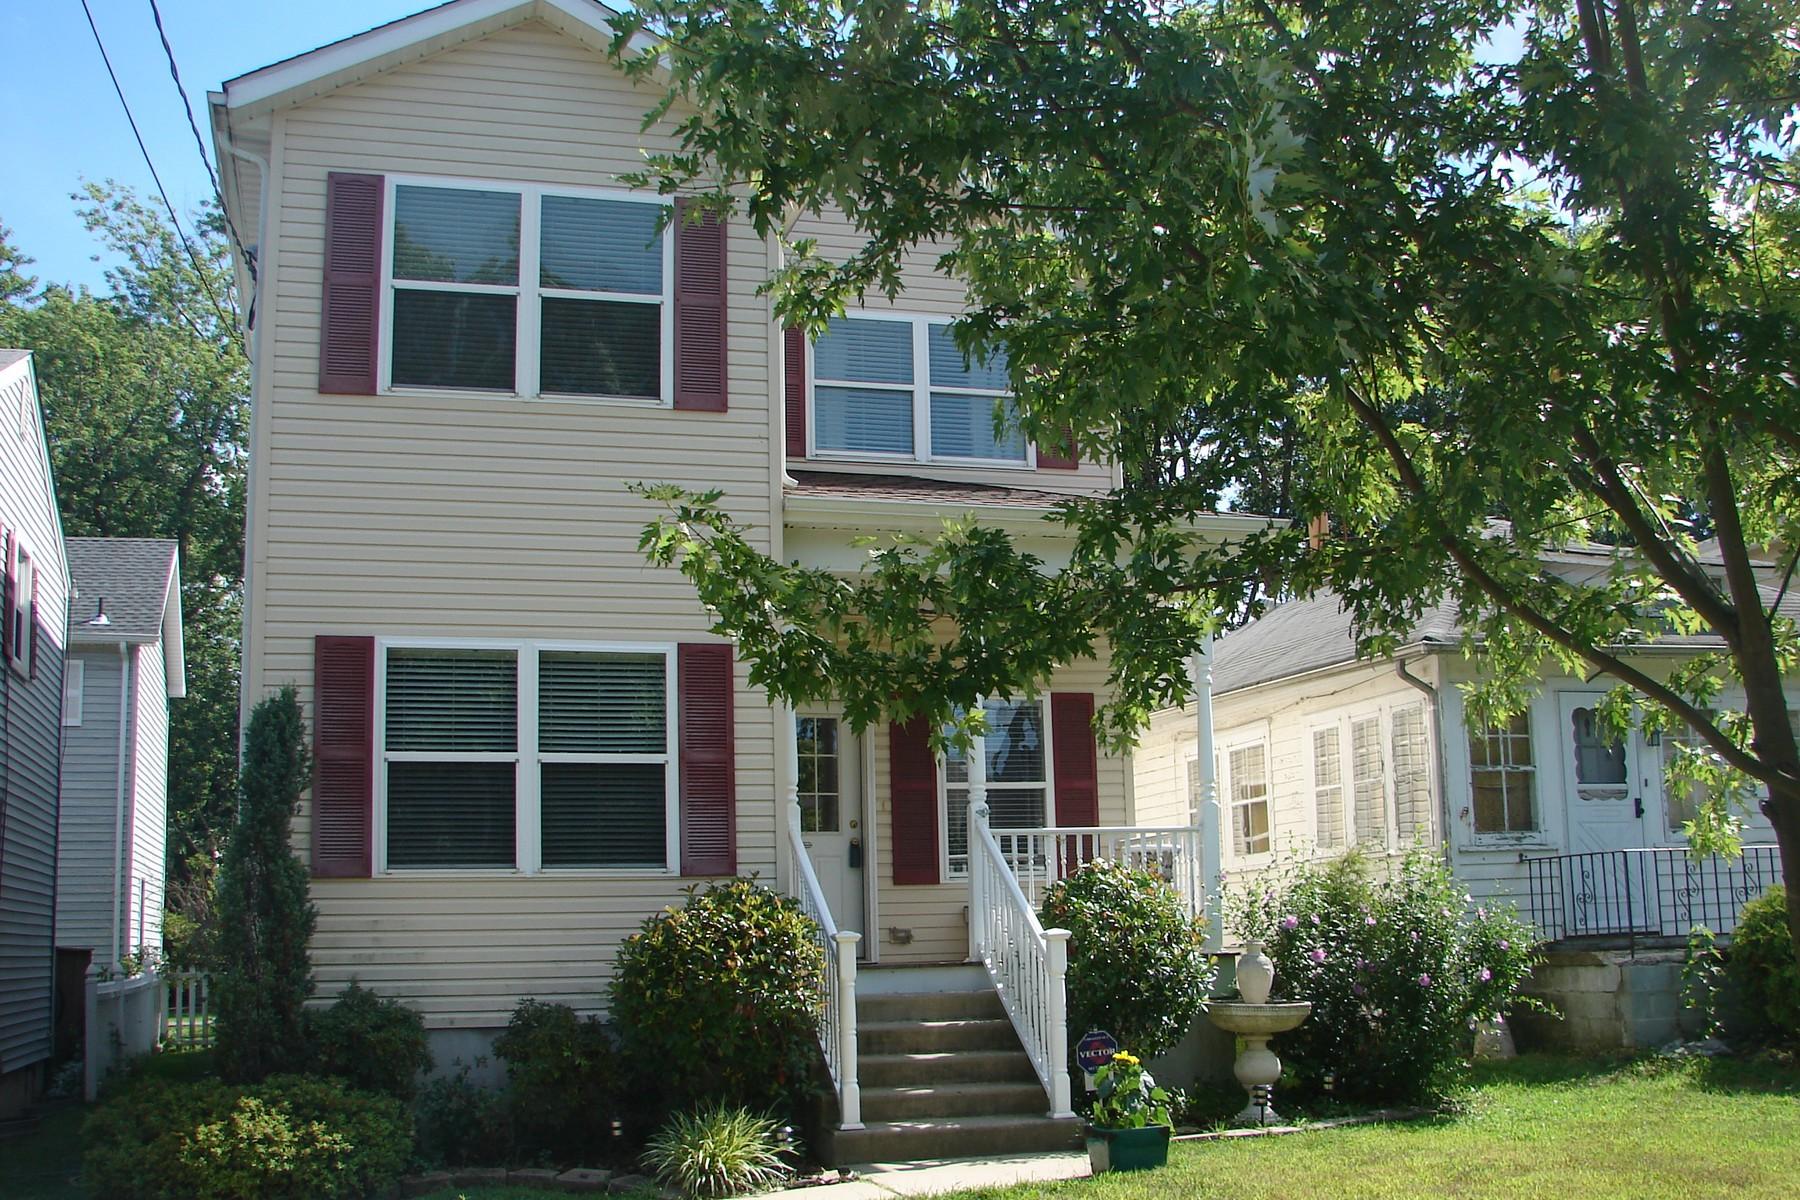 Single Family Home for Sale at 118 Burlington Avenue Leonardo, New Jersey 07737 United States